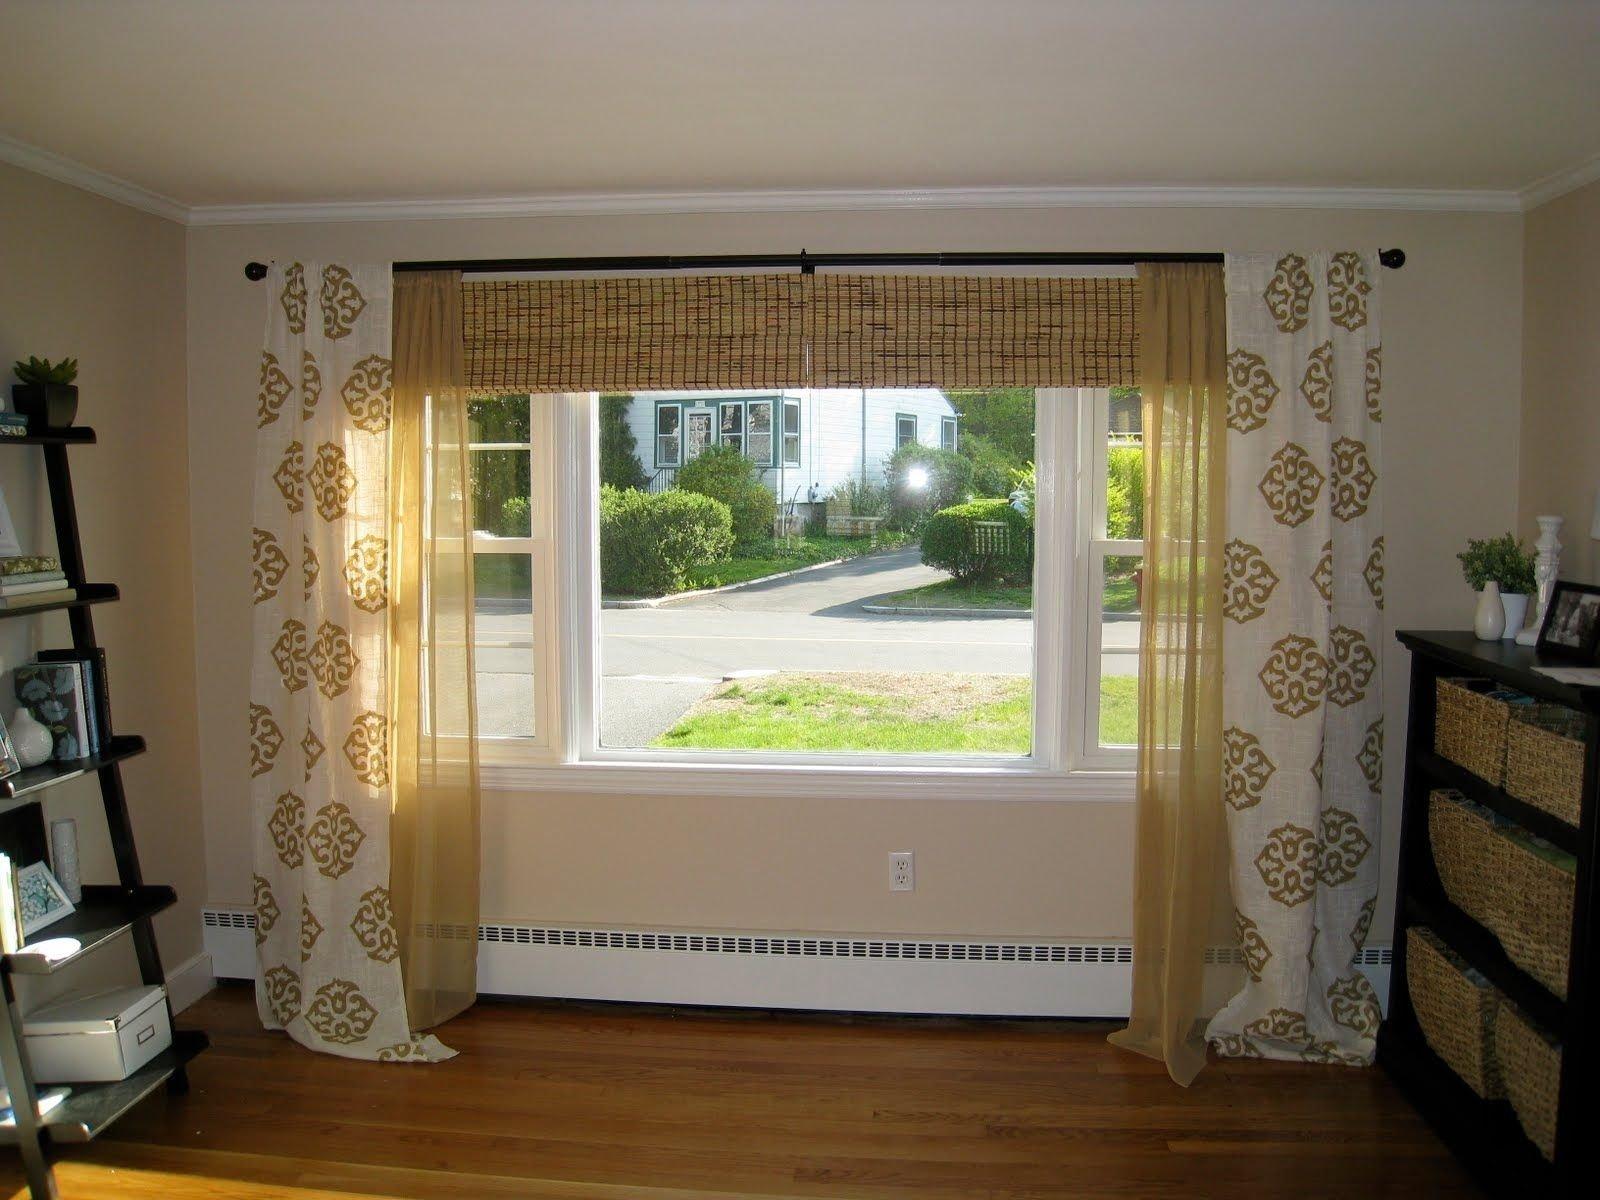 10 Famous Curtain Ideas For Large Windows window ideas for living room curtains round 3 windows 4 2020